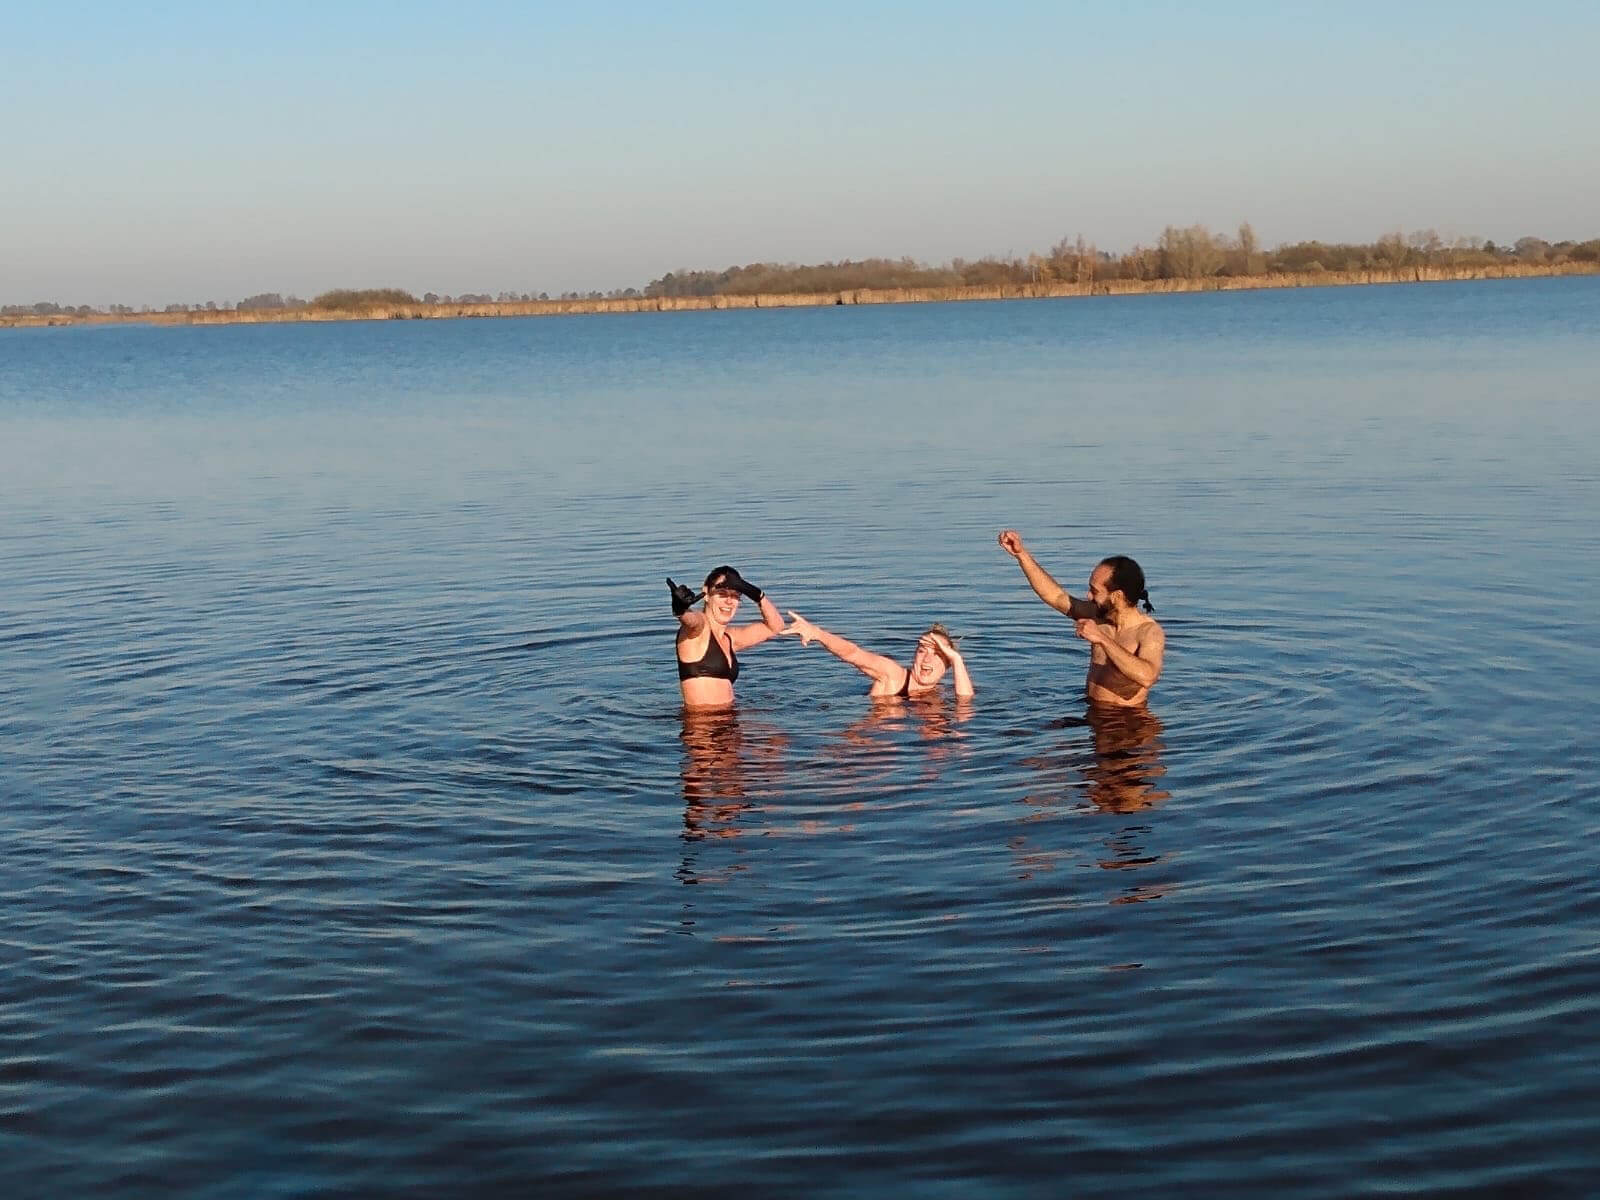 YogaLeeuwarden_Buiten-Zwemmen-Leeuwarden_koude-training_koude-challenge_YogaMetJoska_Privé-yoga_1op1yoga_workshop-wim-hof-leeuwarden